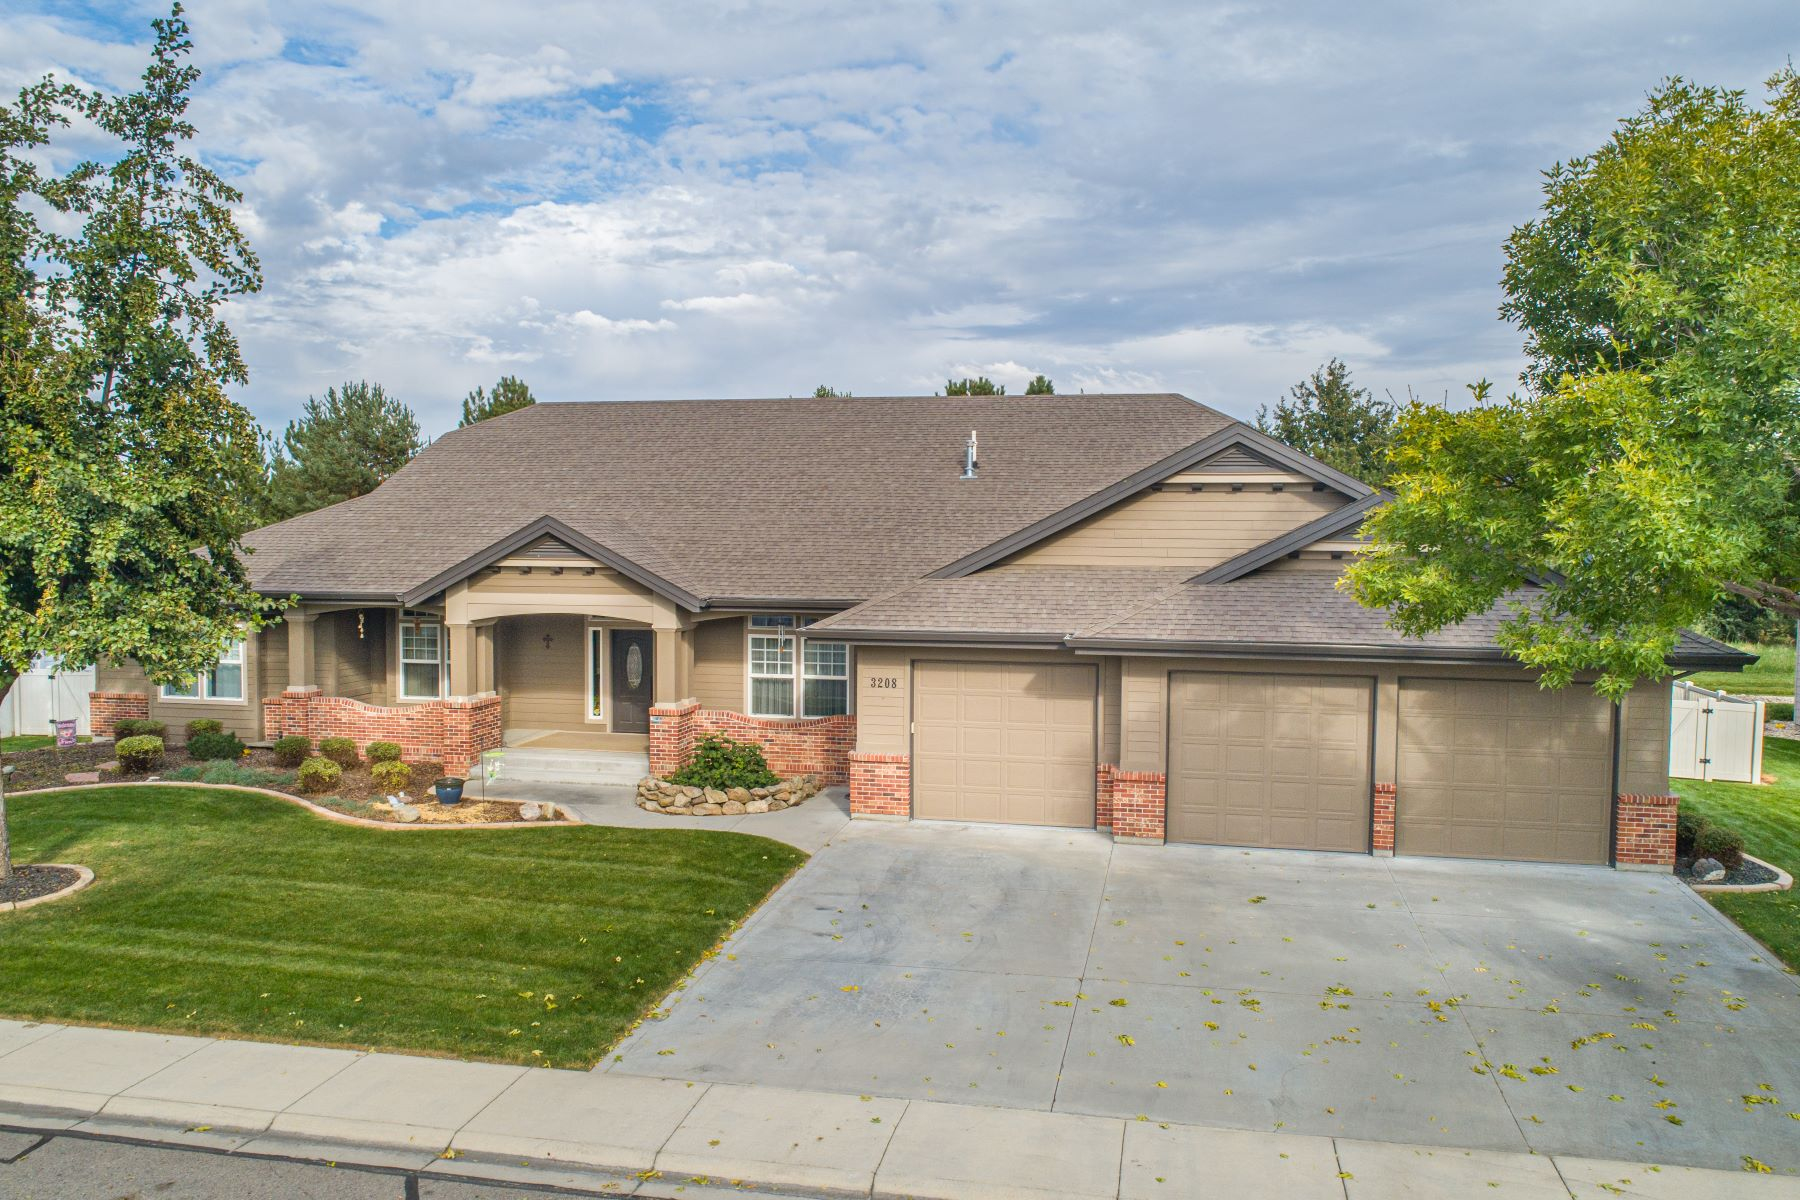 Single Family Homes for Sale at 3208 Montego Way, Nampa 3208 S Montego Way Nampa, Idaho 83686 United States